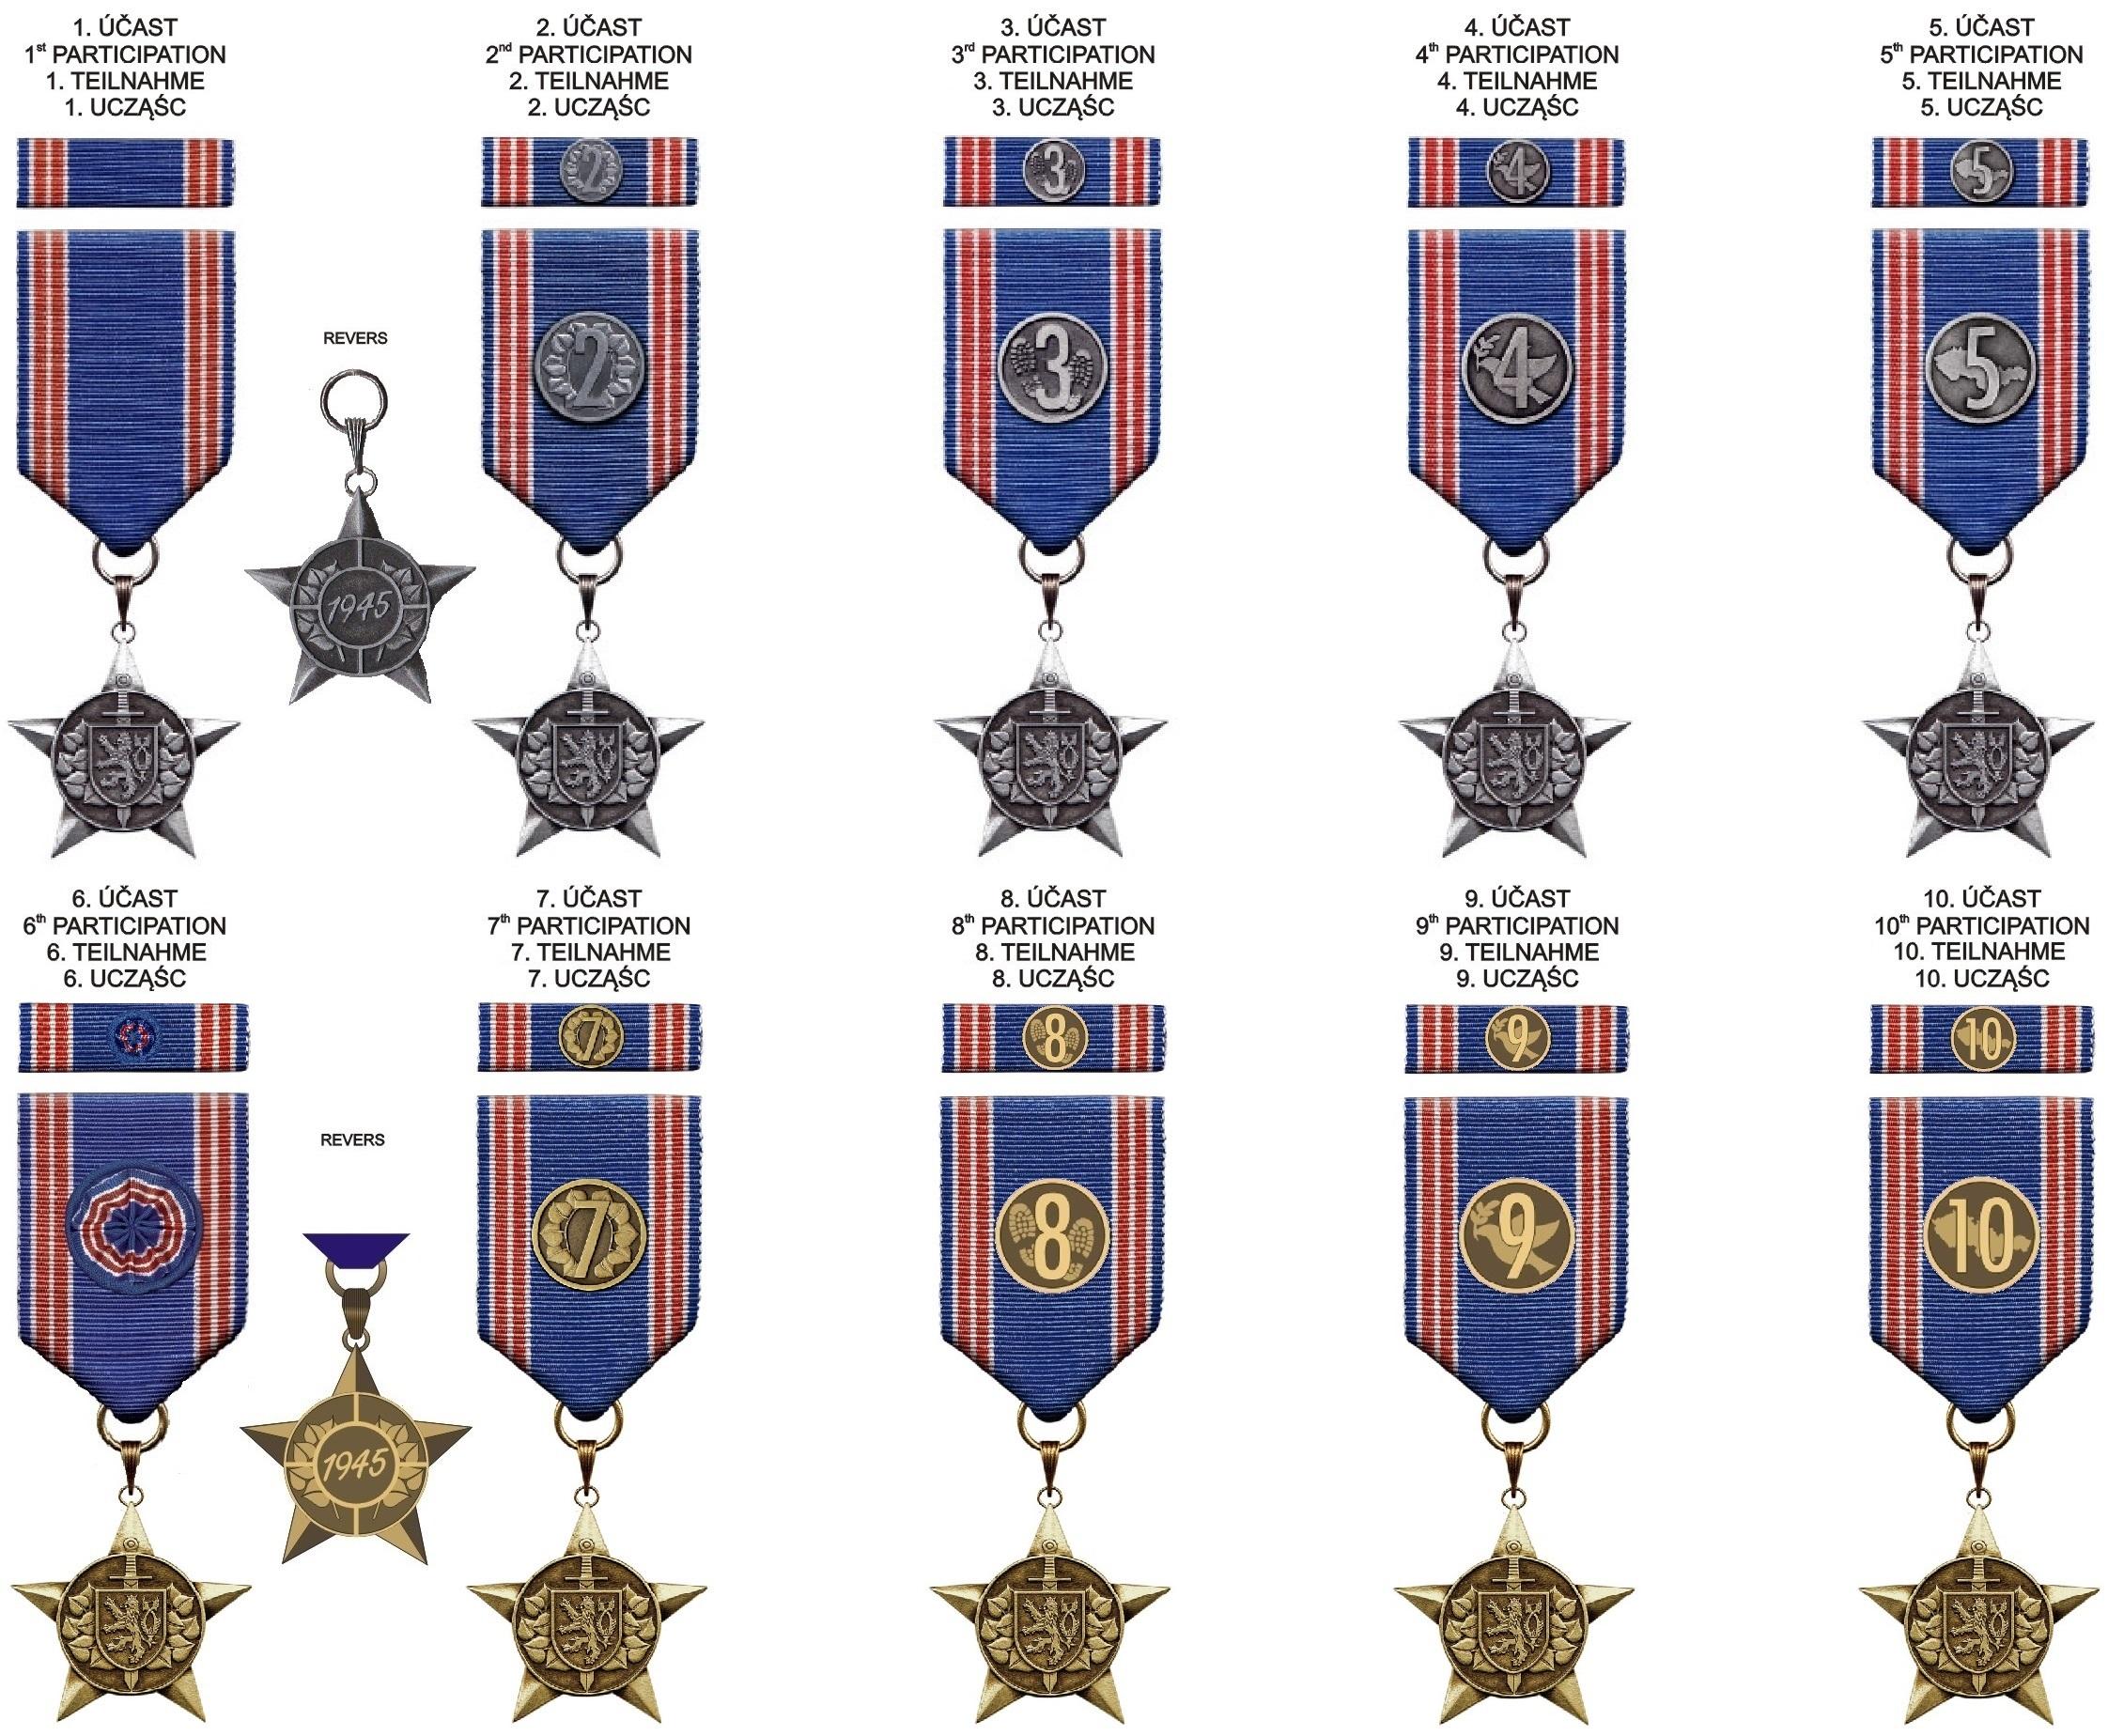 VOJCHOD medaile